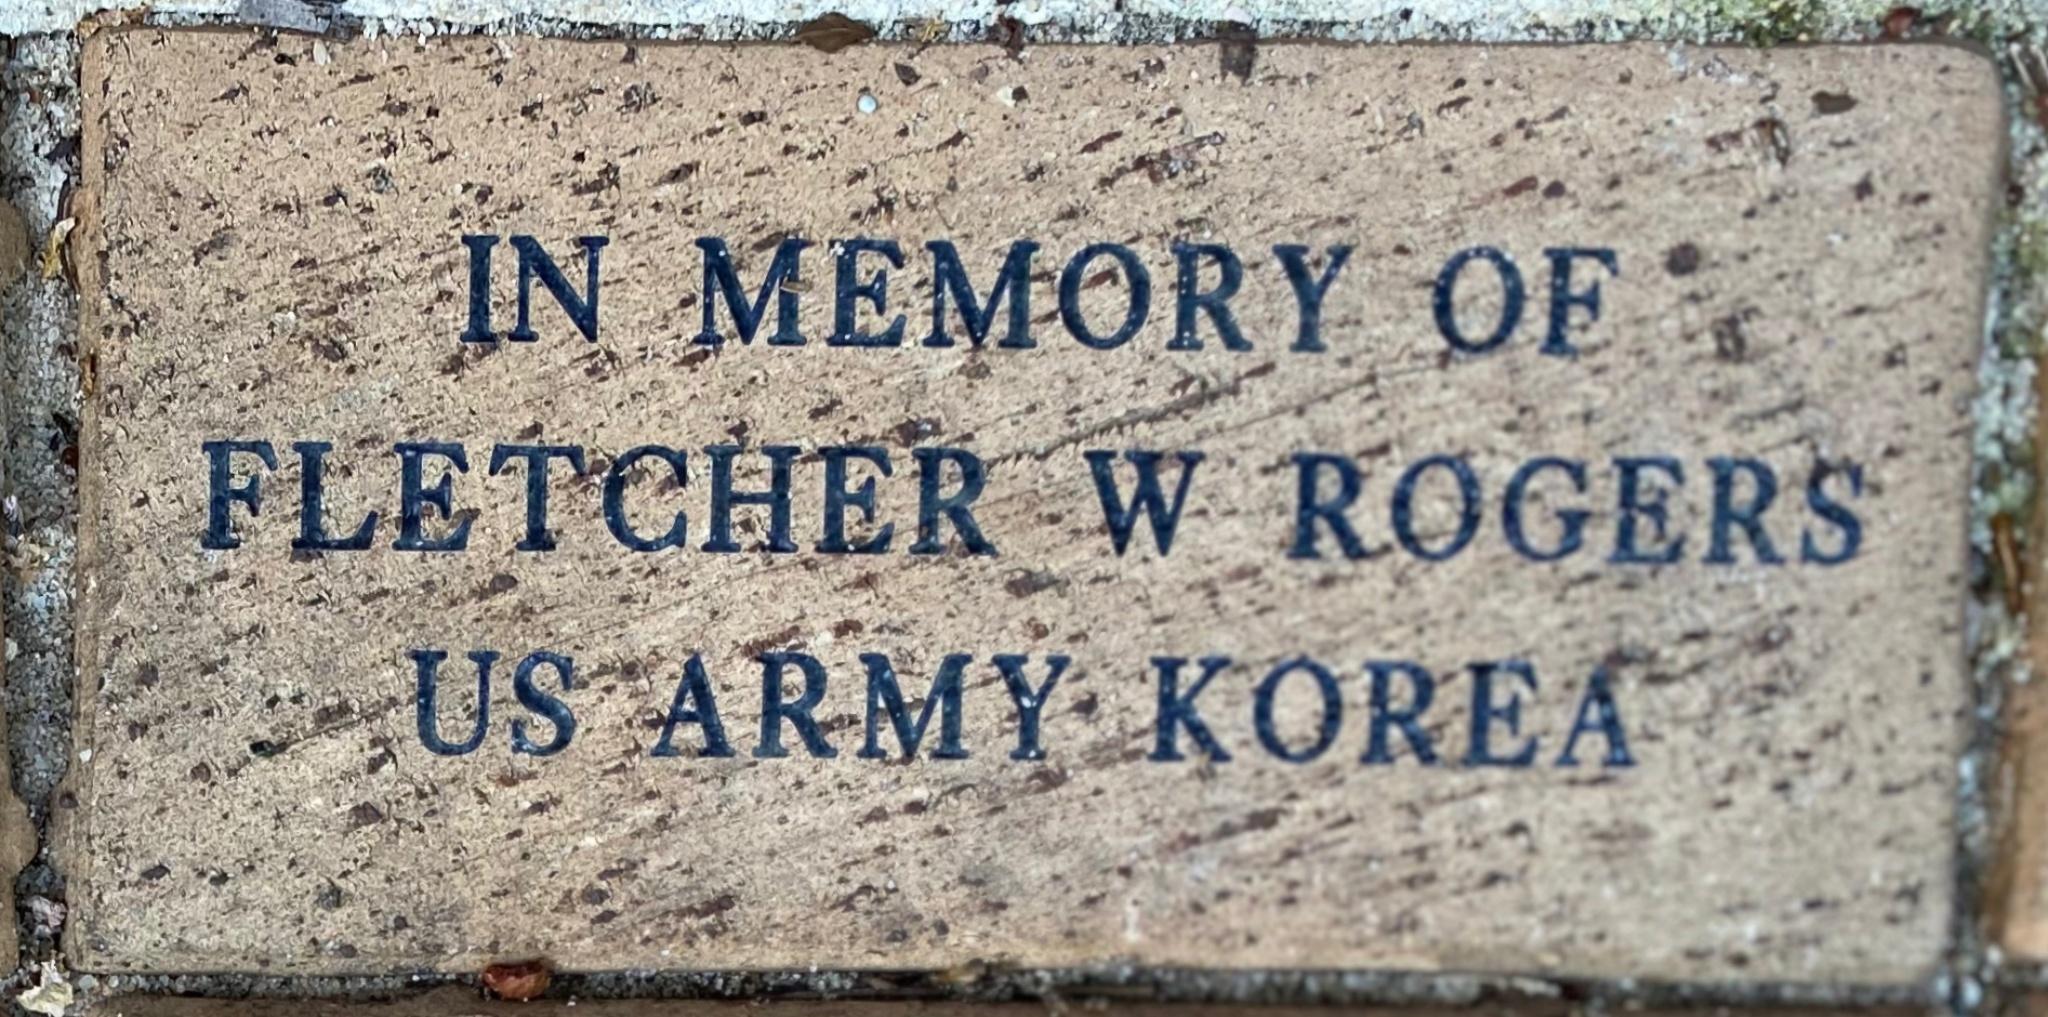 IN MEMORY OF  FLETCHER W ROGERS US ARMY KOREA